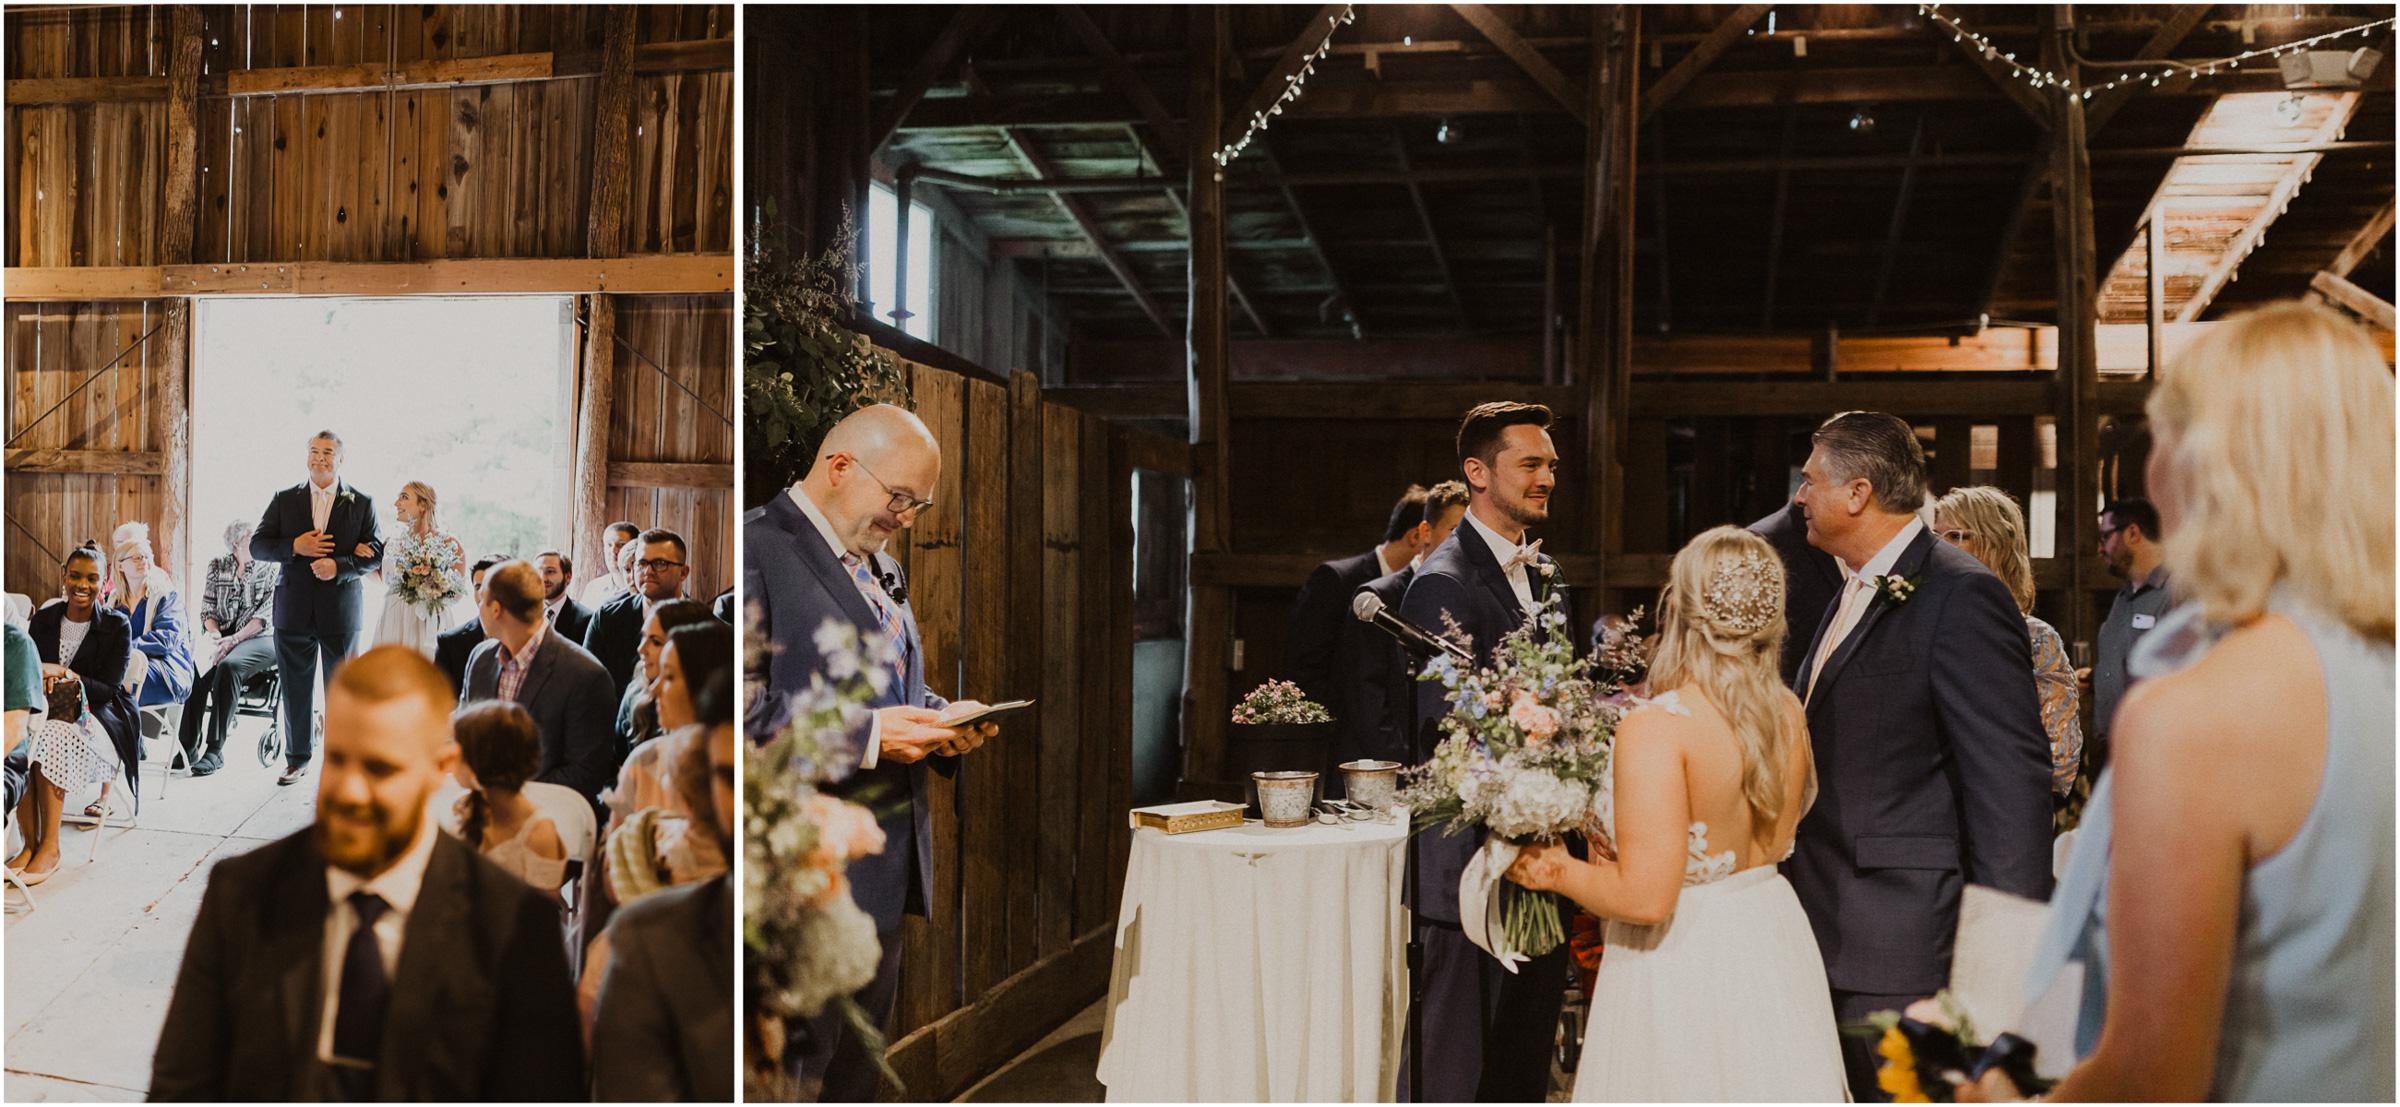 alyssa barletter photography nelson wedding nebraska city lied lodge morton barn spring wedding photographer-34.jpg